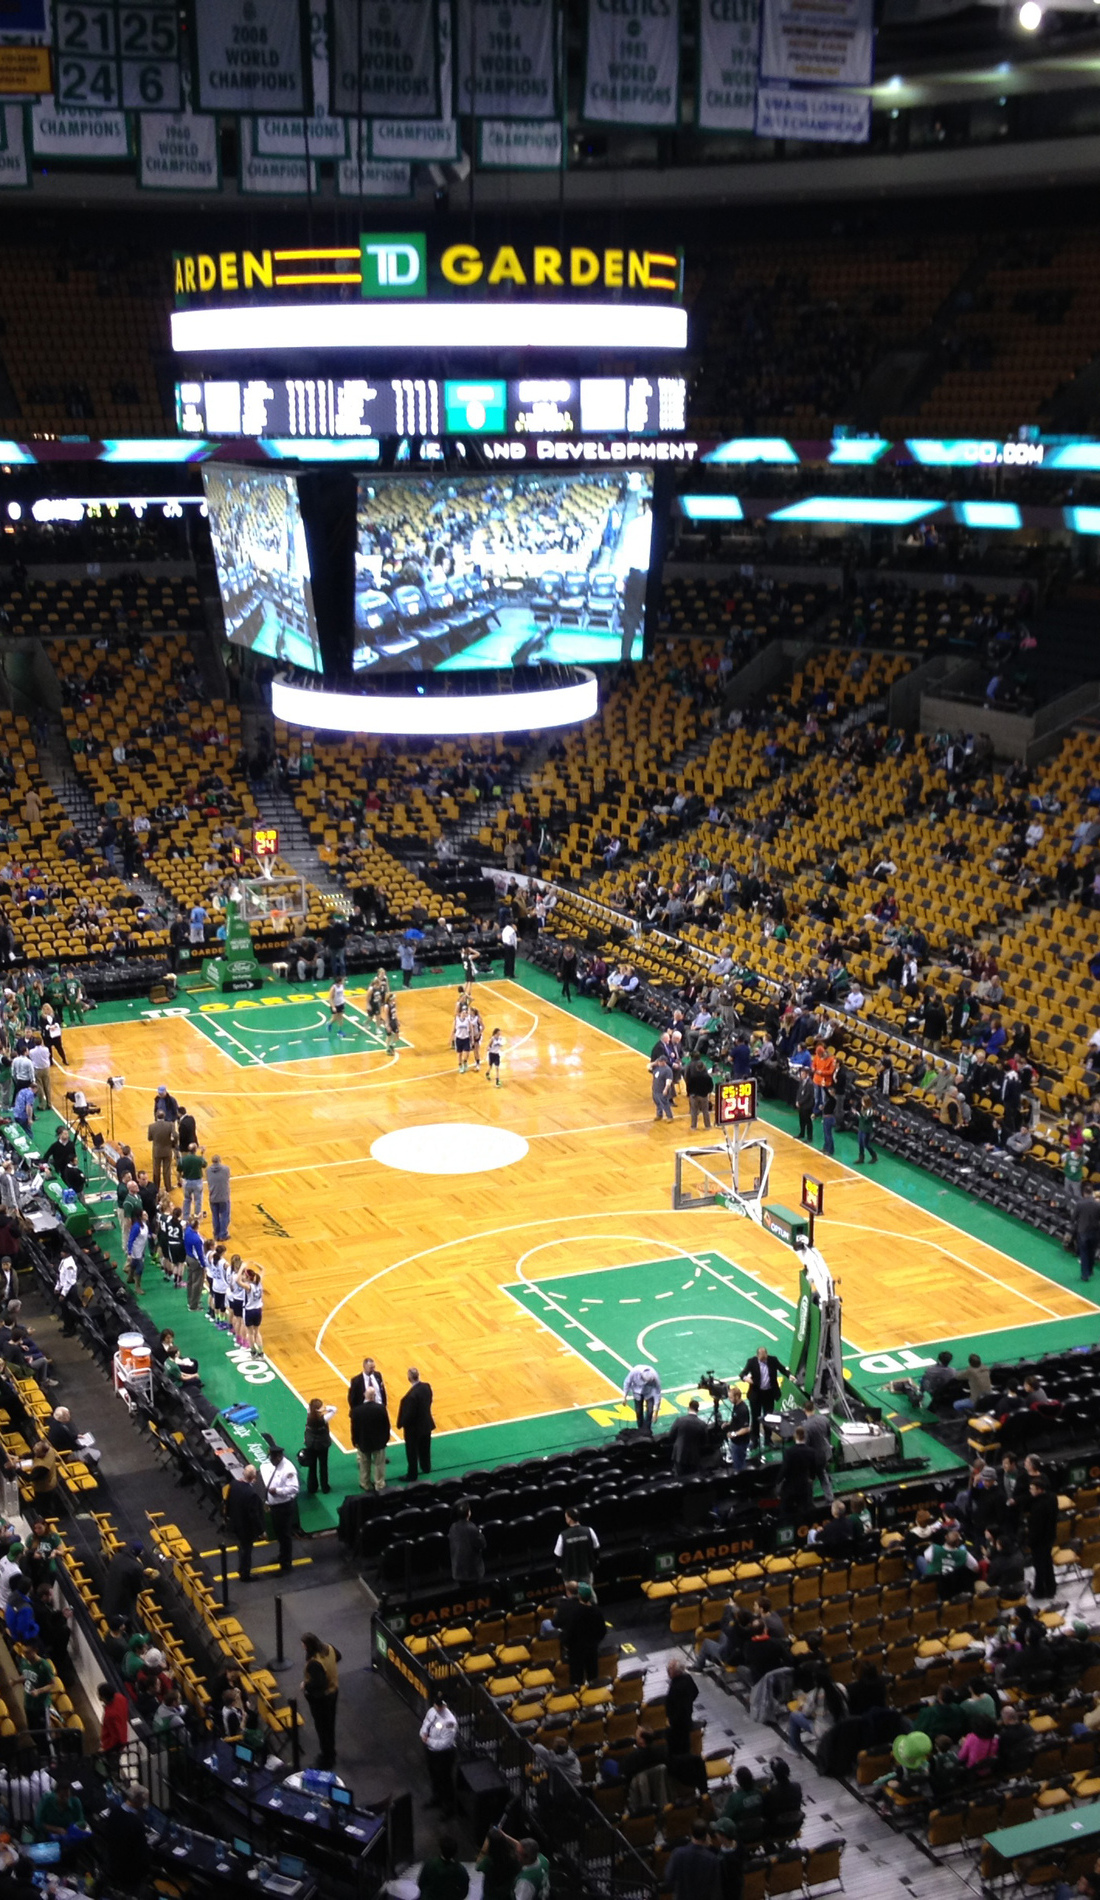 A Boston Celtics live event